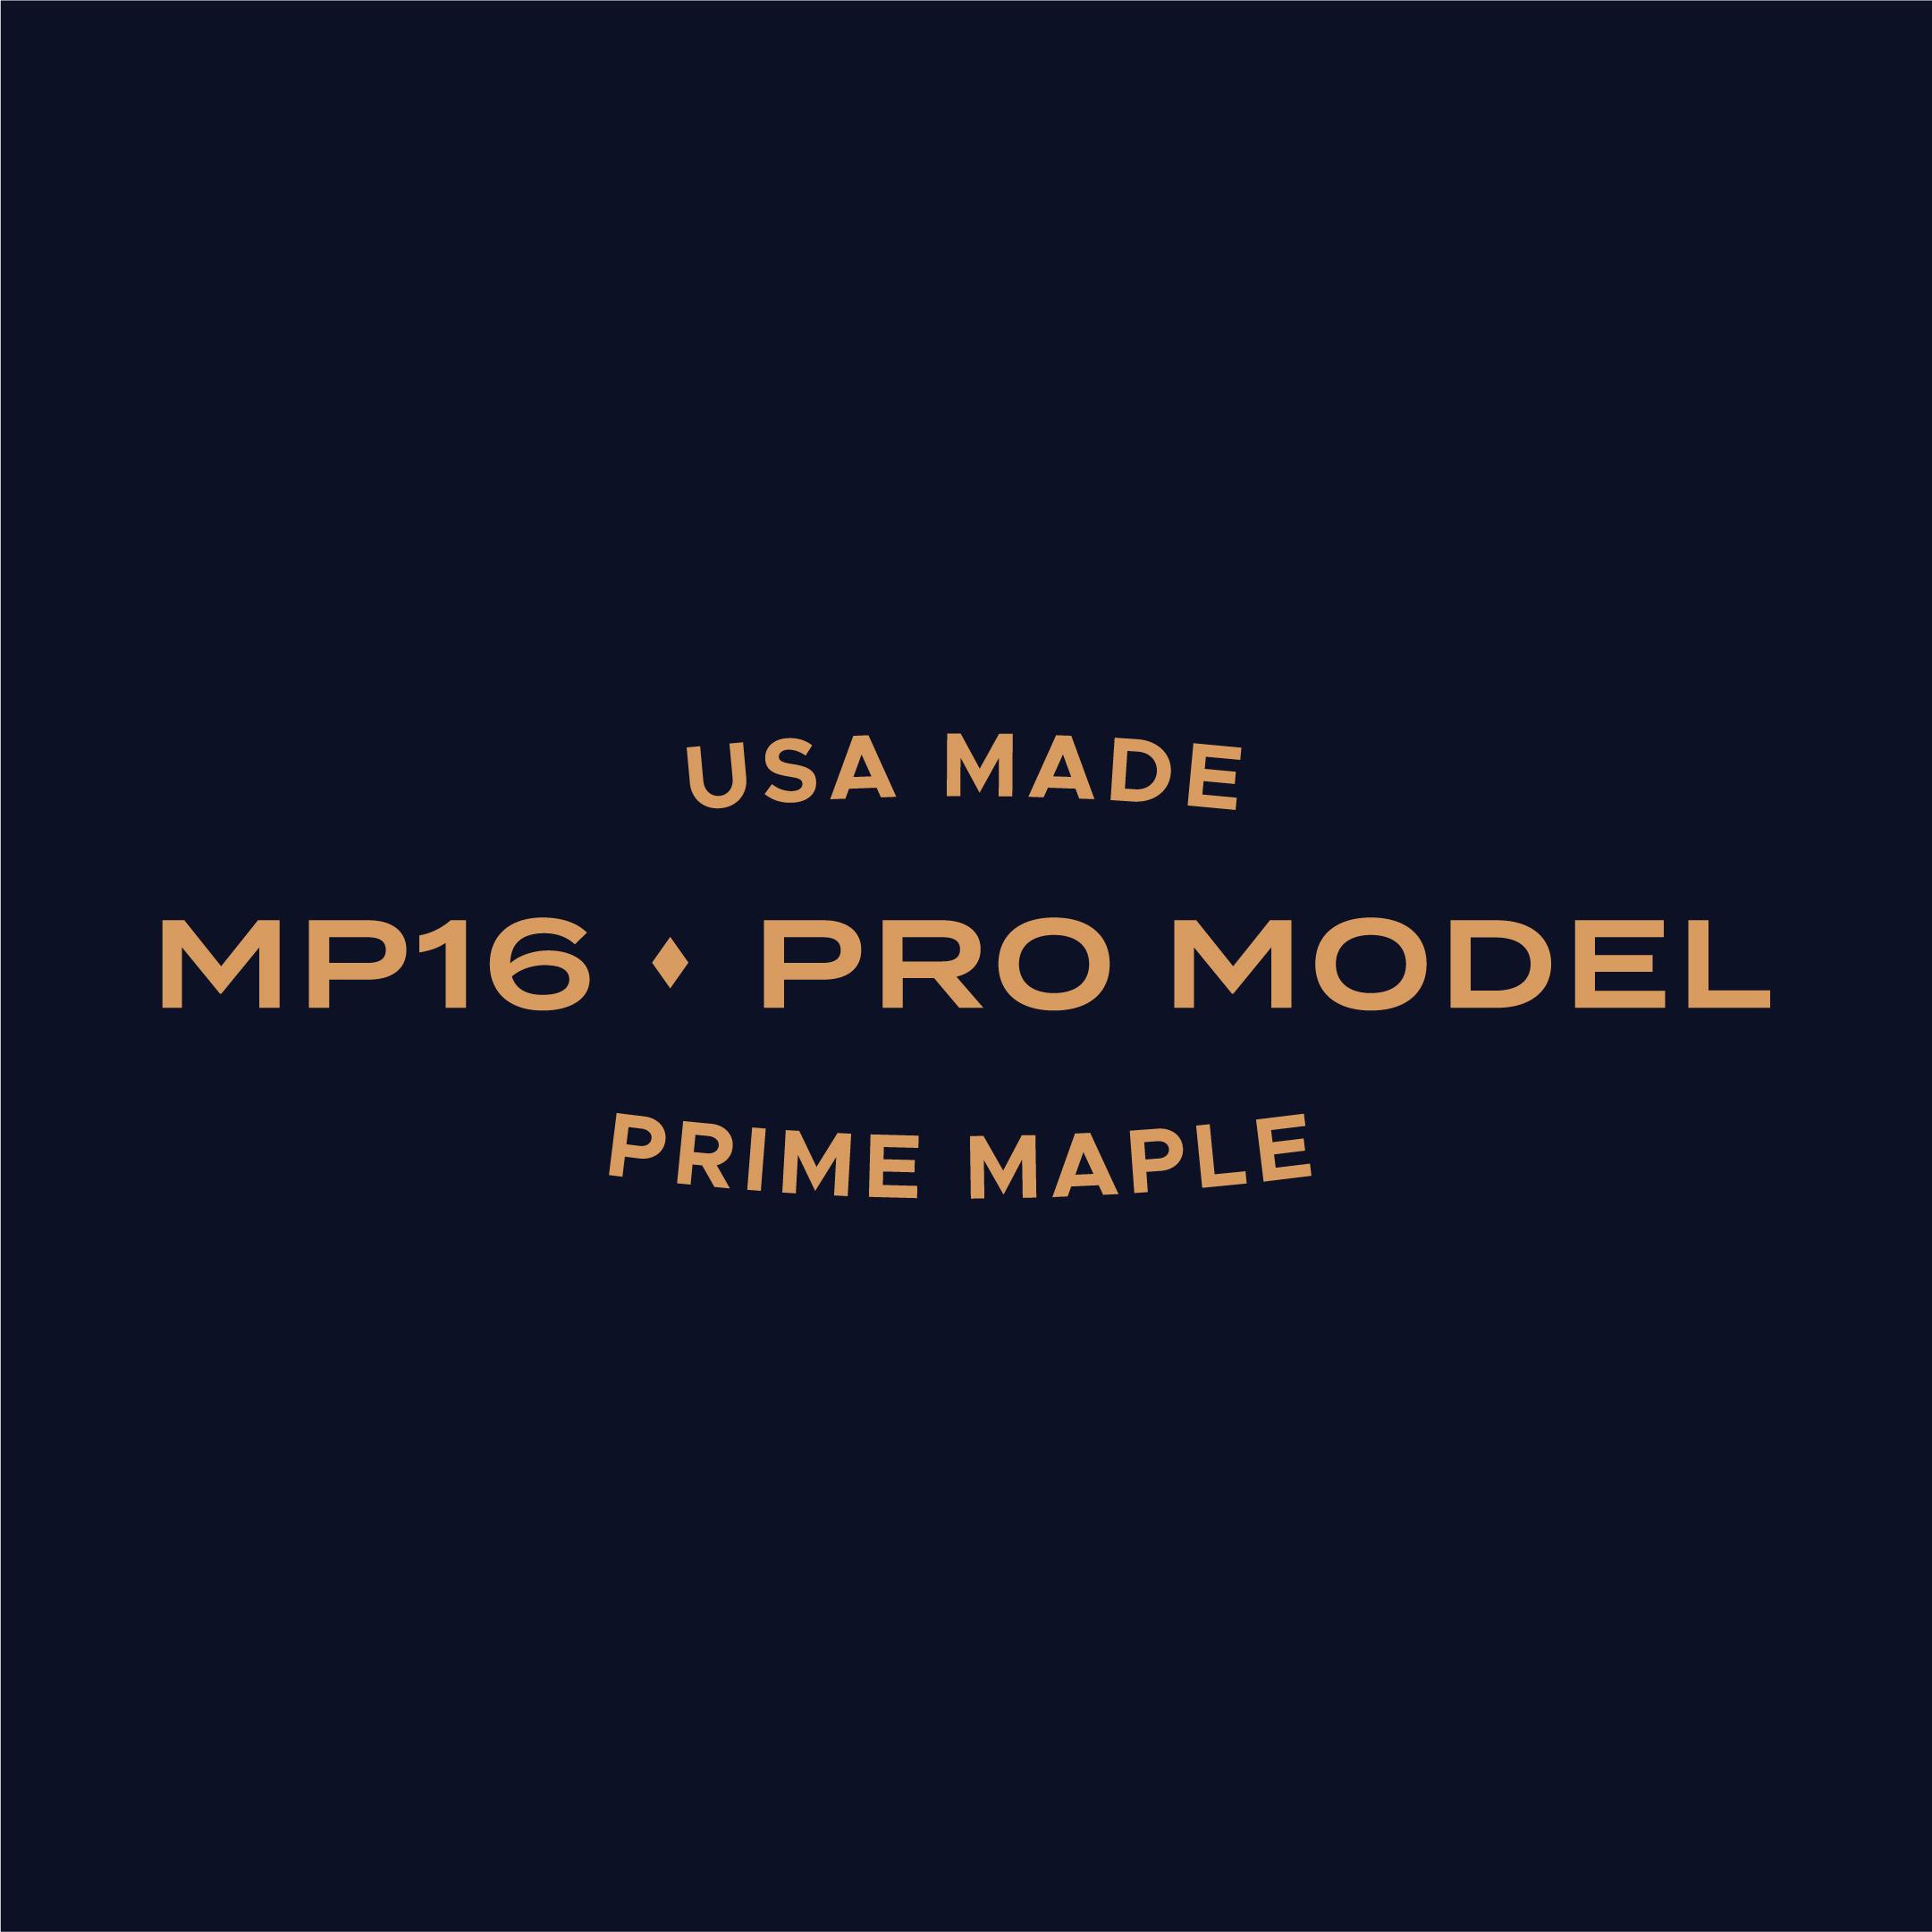 mp16 pro model